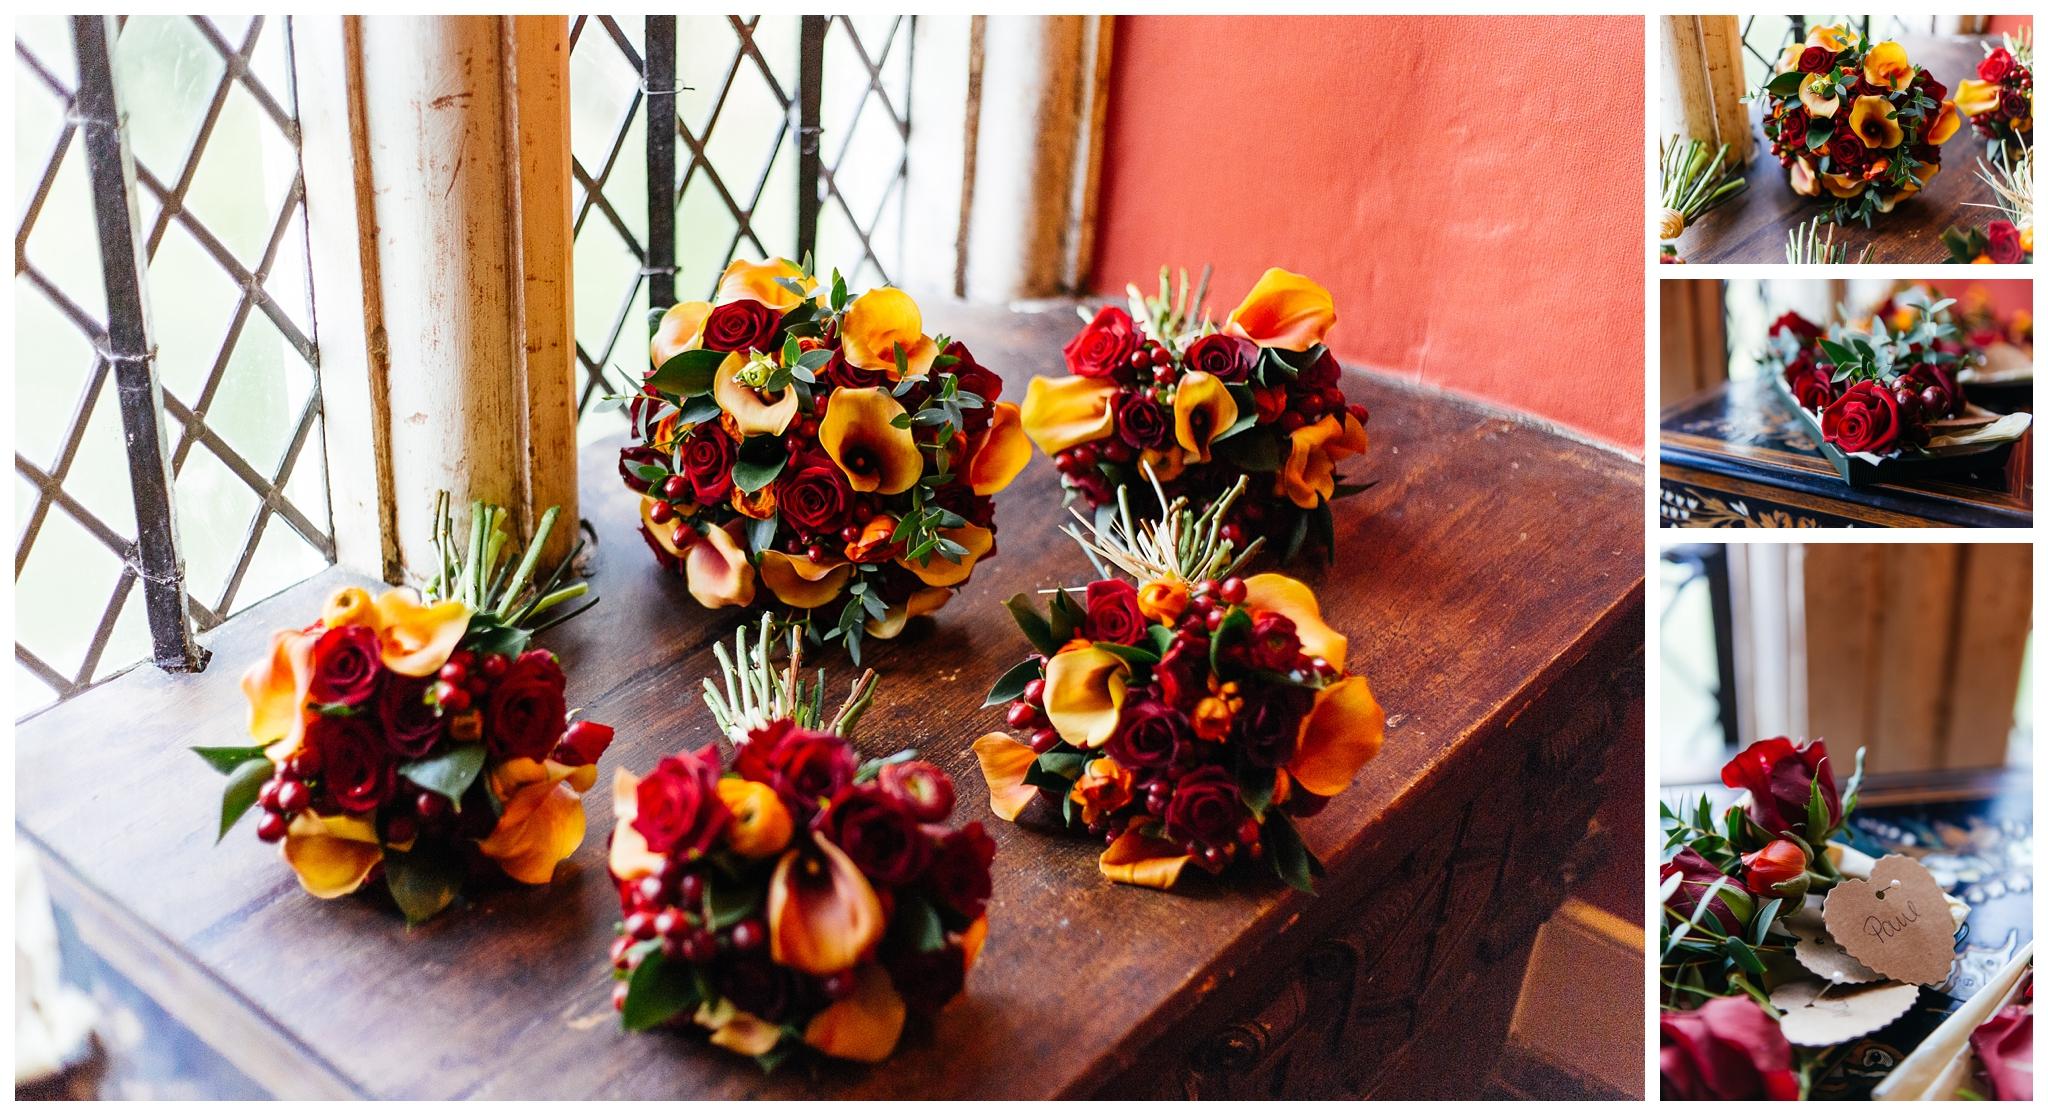 Emma&Paul-Elmore-Court-Winter-Wedding-Nikki-Cooper-Photography_0014.jpg